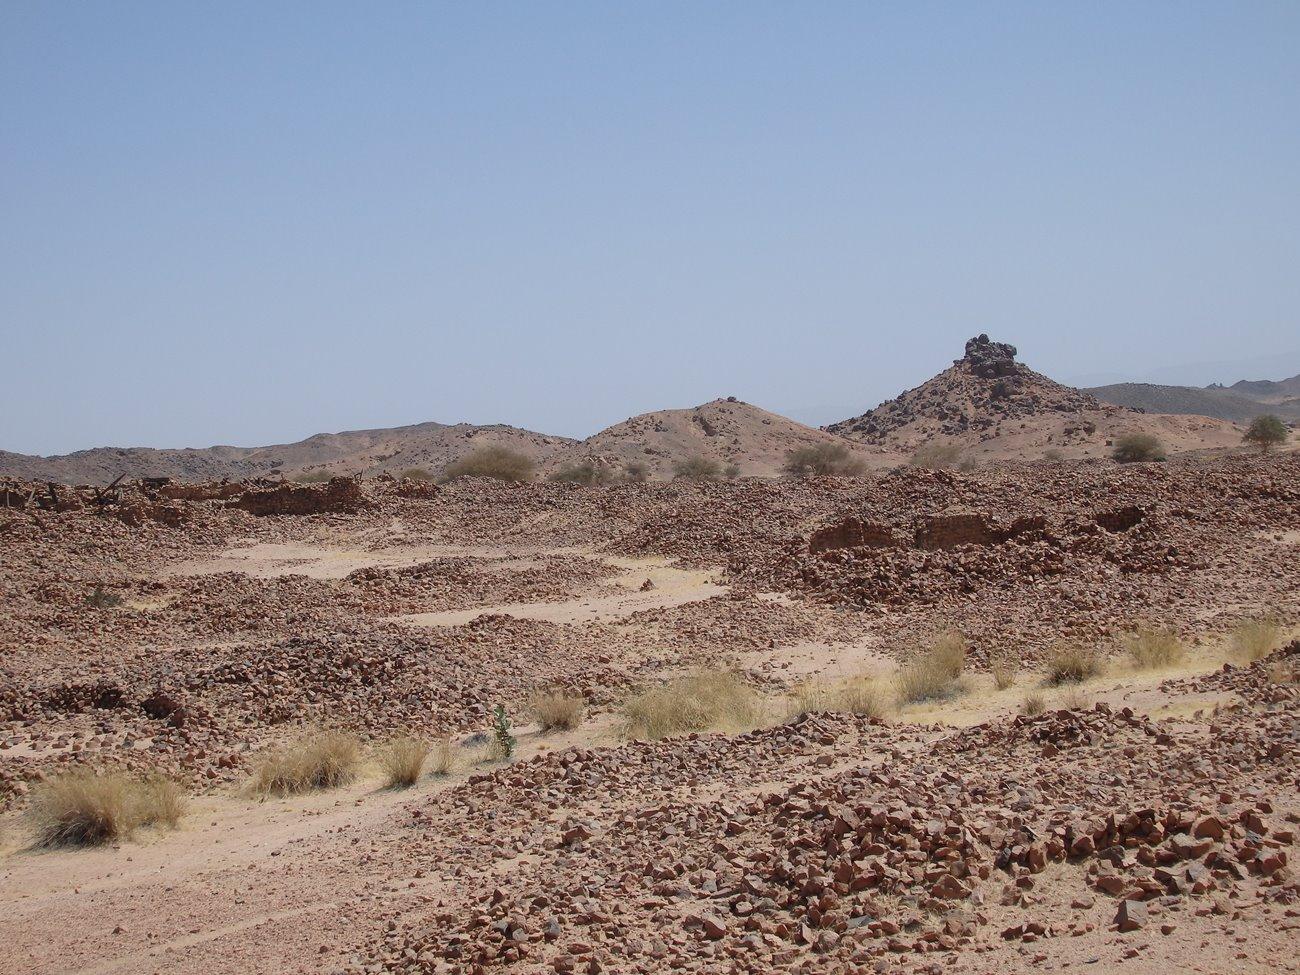 Deserto-dellAir-Niger-1